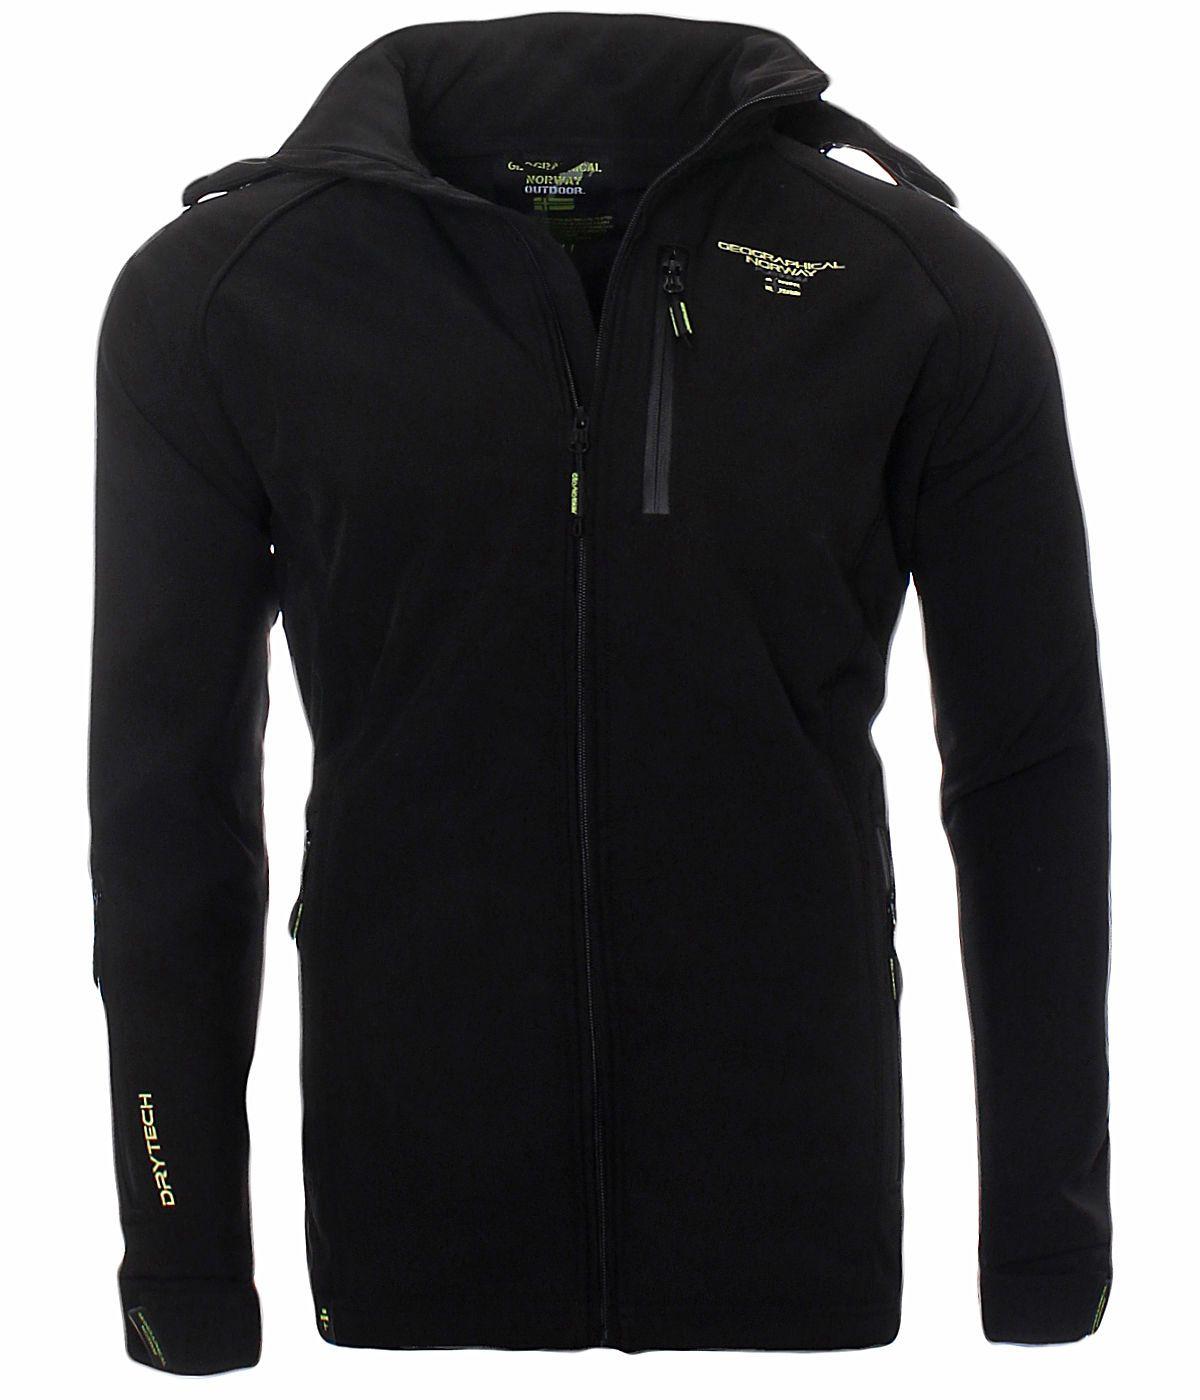 Geographical Norway Herren Softshell Jacke Hoodie Wasserdicht Gr S 3xl Softshell Jacke Jacken Mode